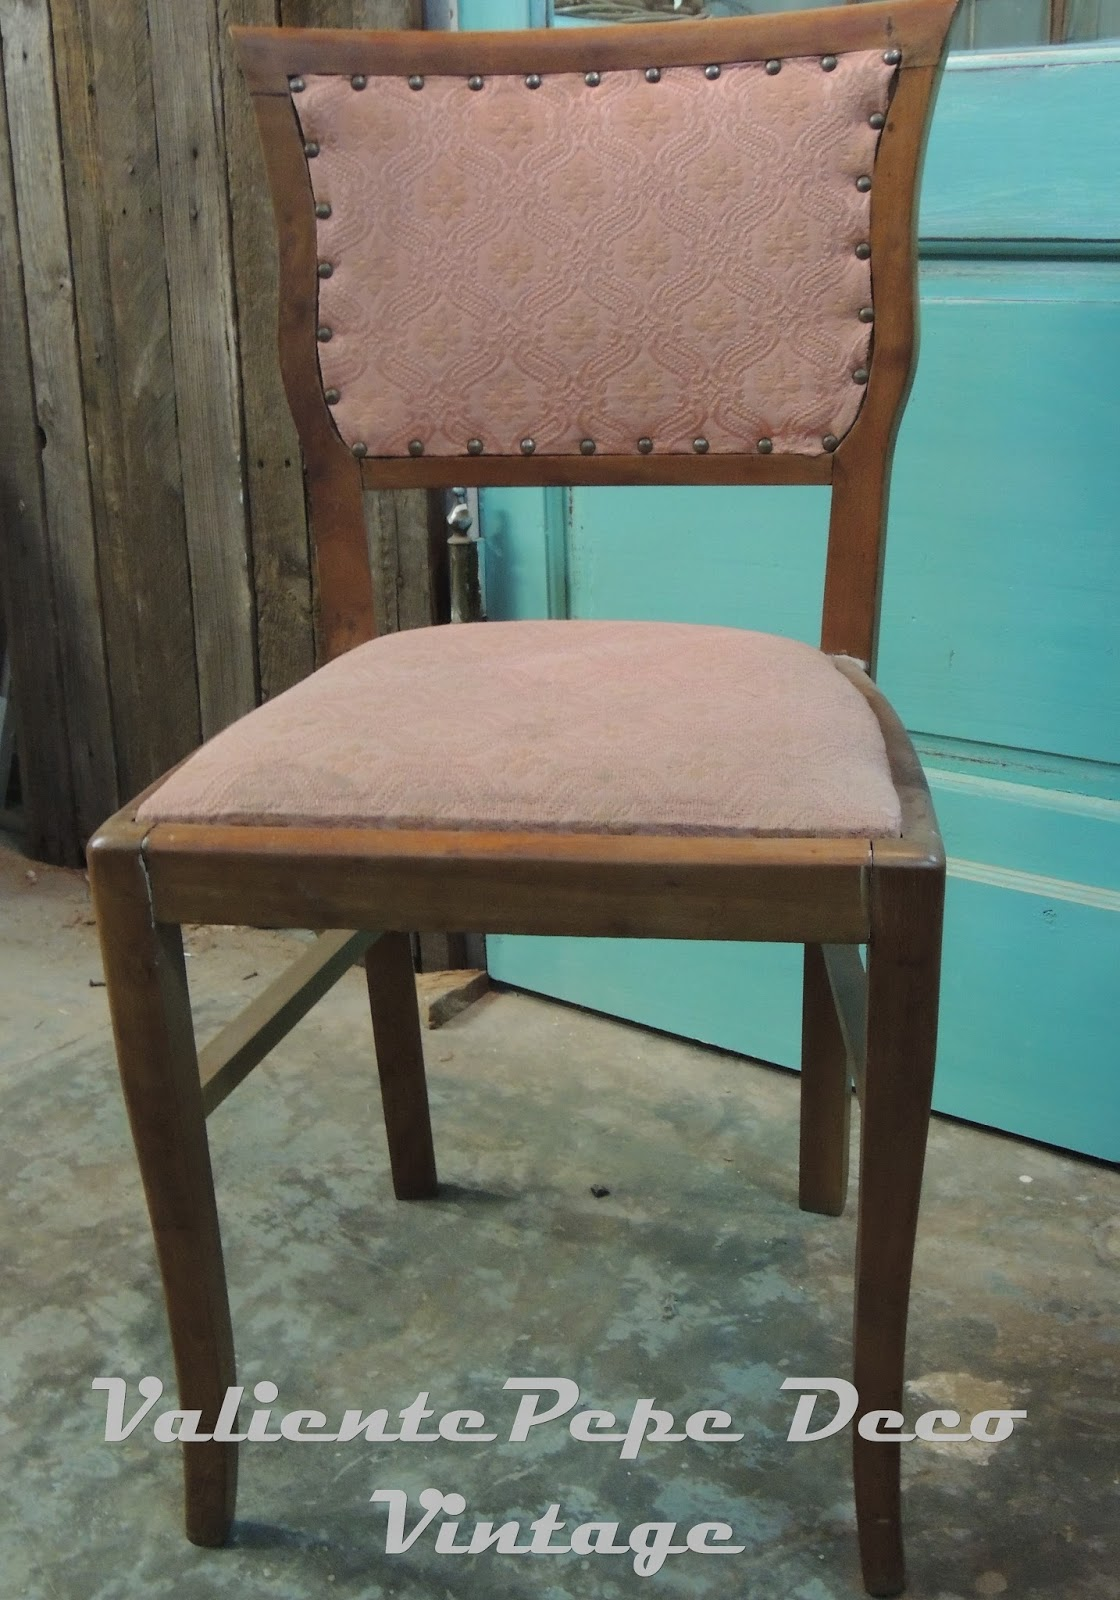 Juego de 6 antiguas sillas francesas tapizadas valiente pepe - Tapizado de sillas antiguas ...